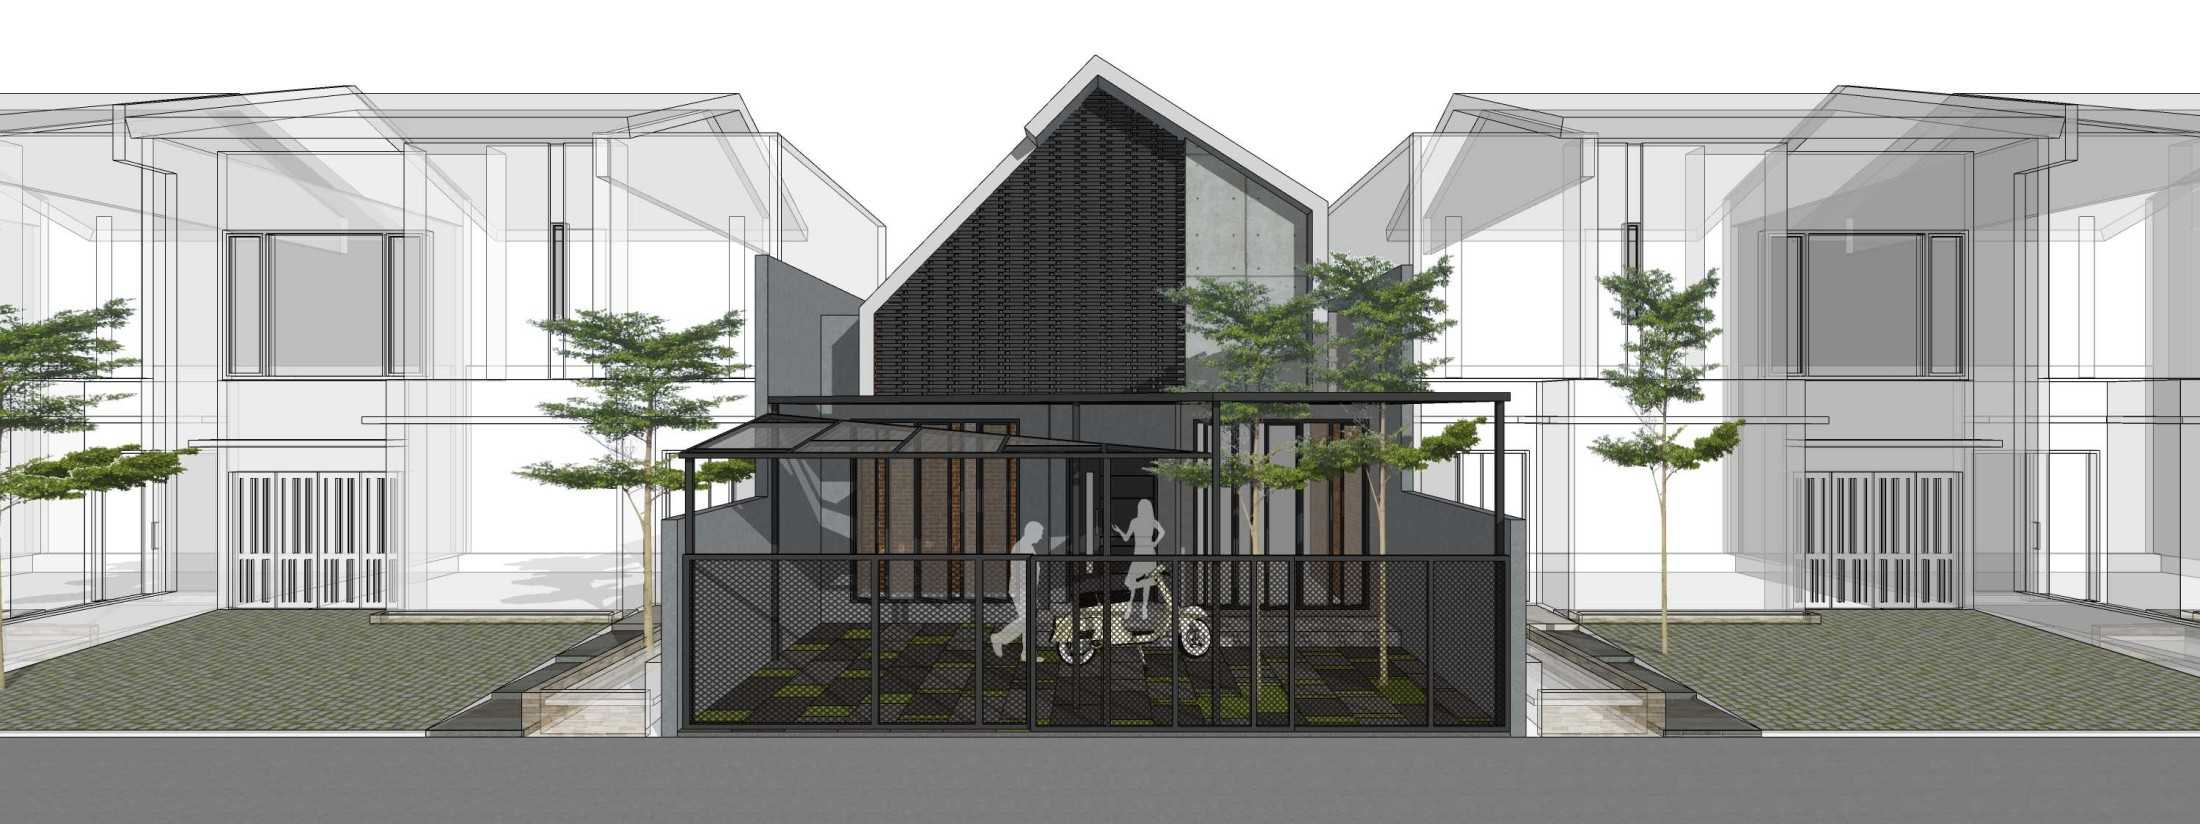 MIV Architect (Alfachri Kamarullah) di Bojonegoro